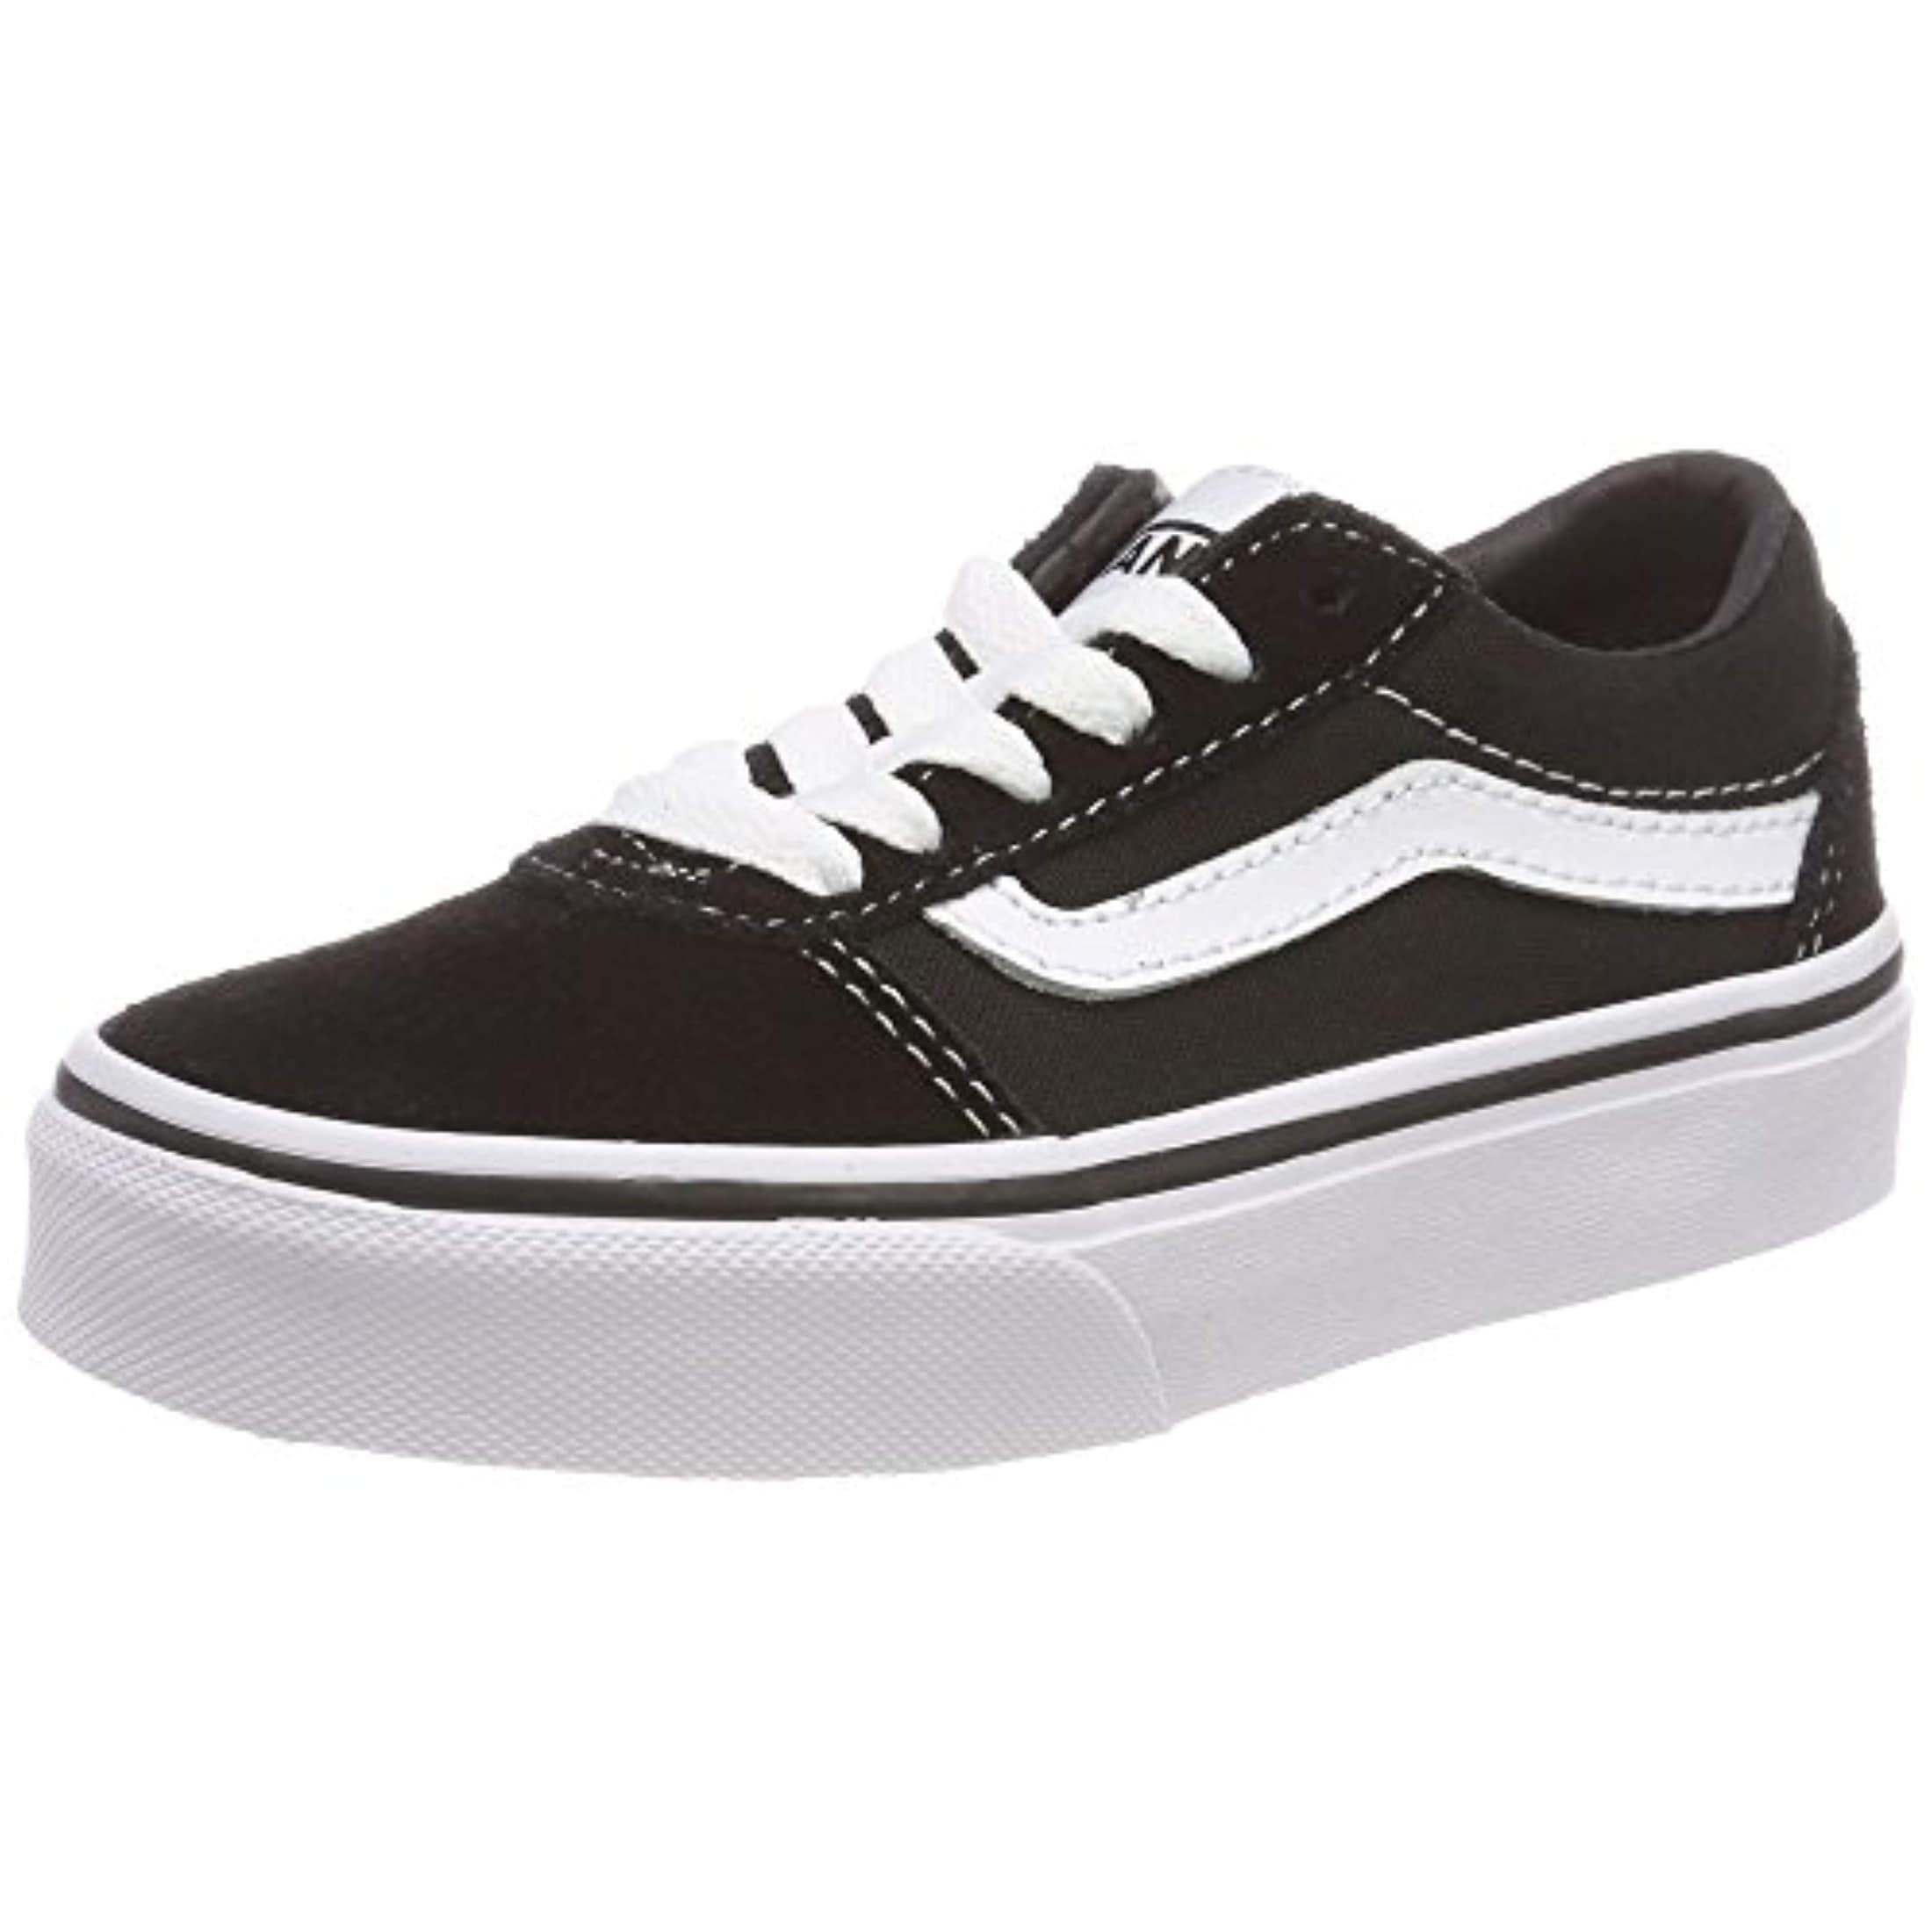 6630b65863a02b Shop Vans Unisex Boys Ward Low-Top Sneakers